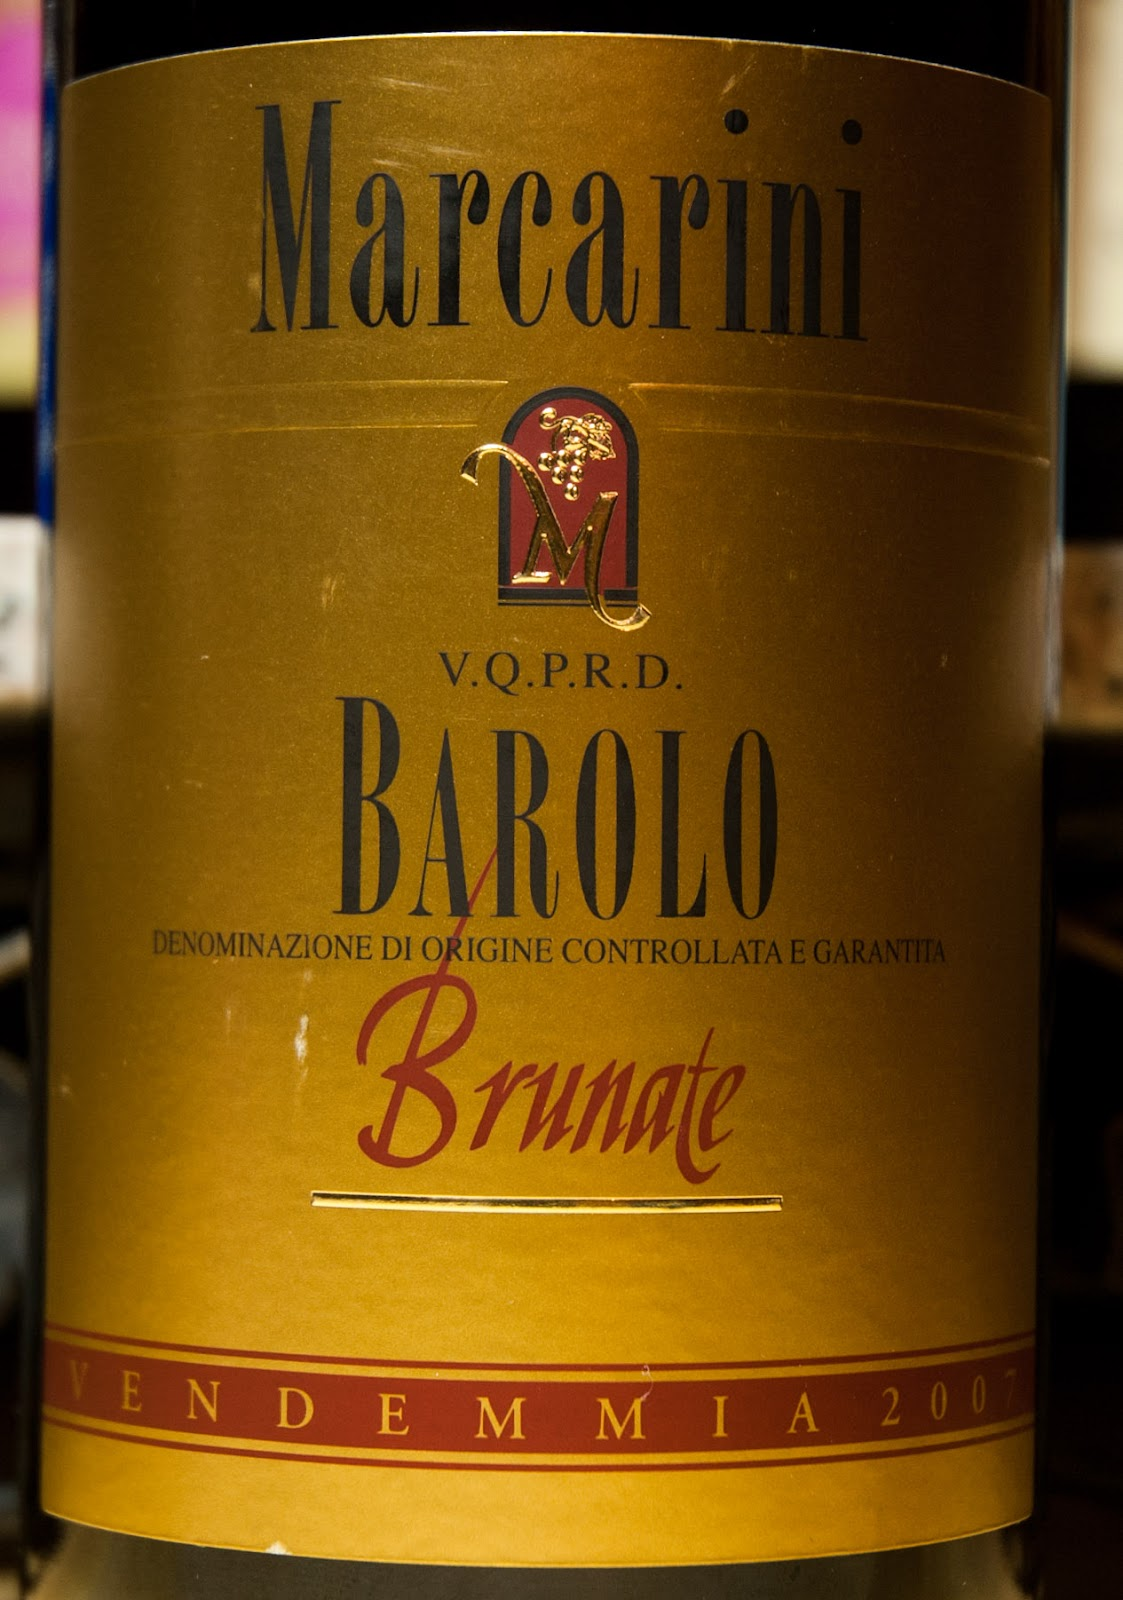 Barolo Brunate Marcarini 2007 Marcarini Barolo Brunate